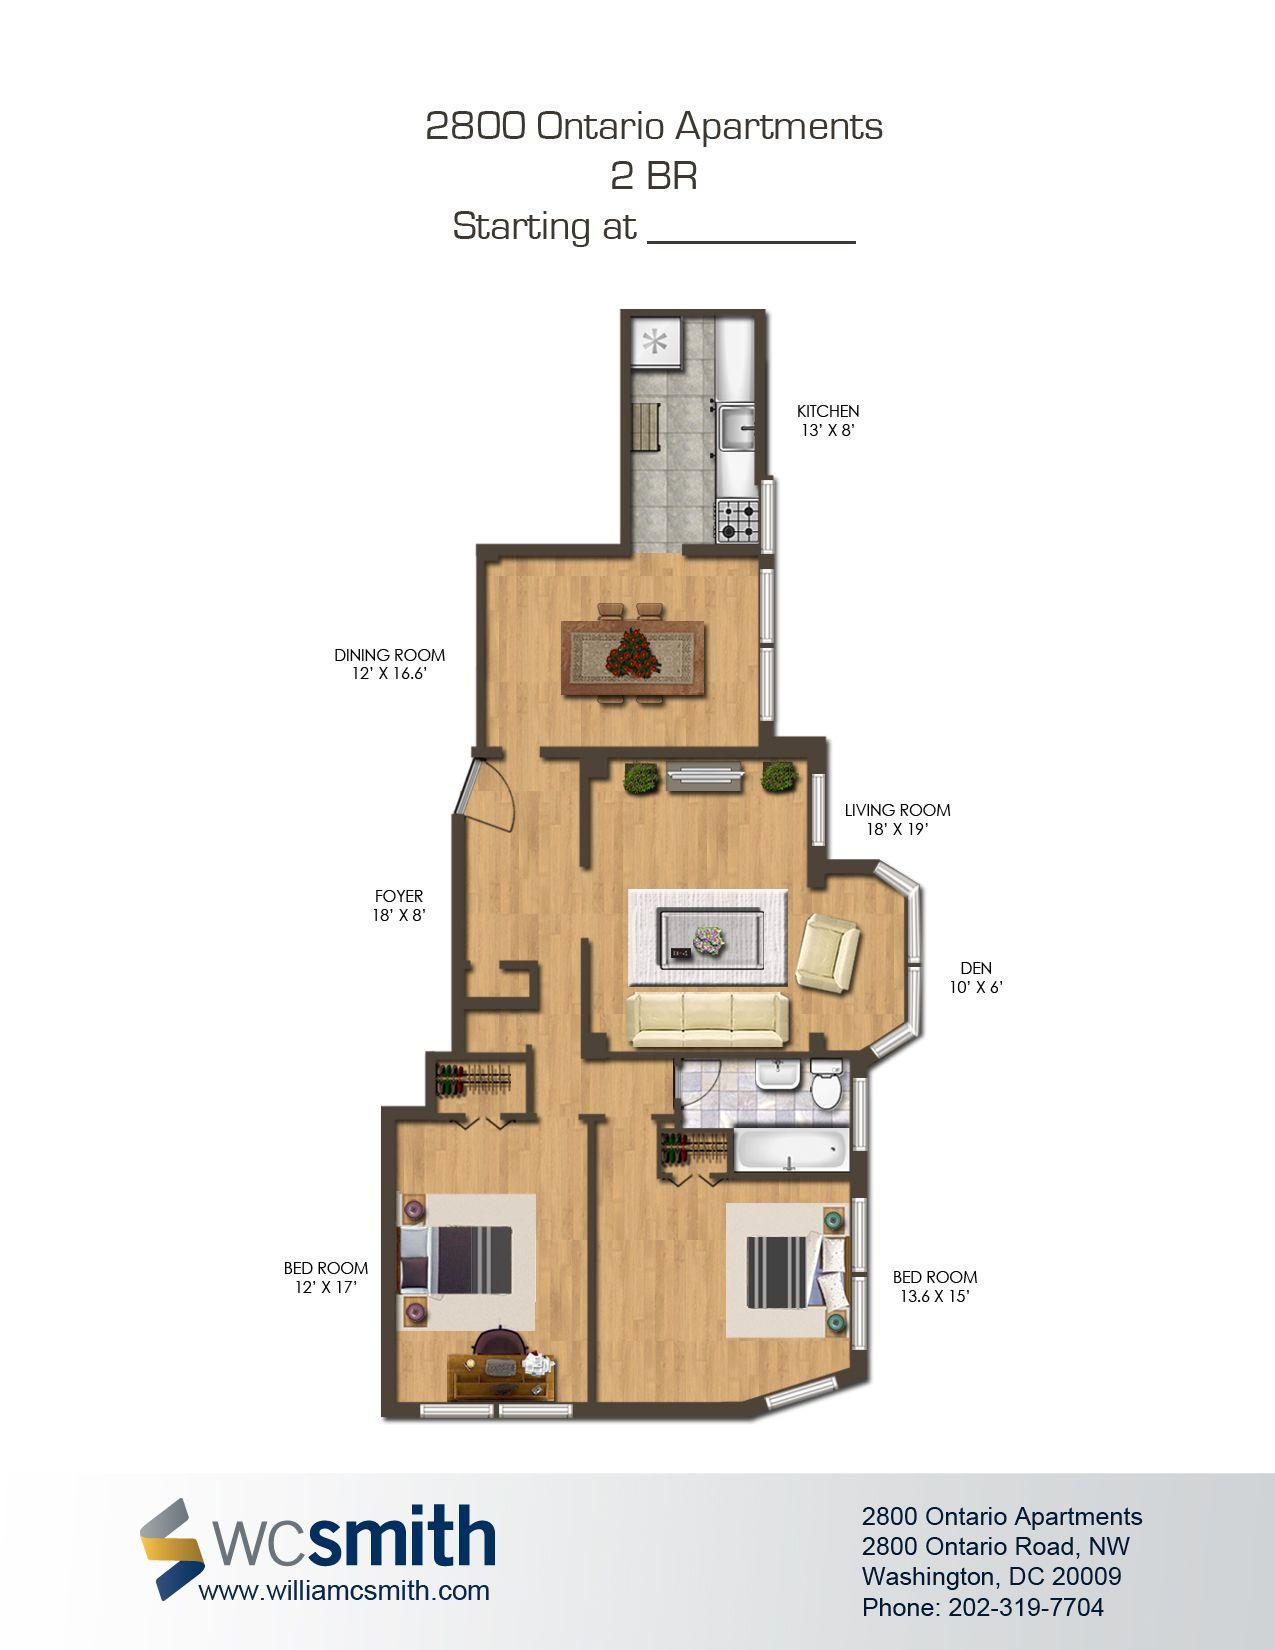 2 Bedroom Floor Plan 2800 Ontario In Northwest Washington Dc Wc Smith Apartments Adams 2 Bedroom Floor Plans Washington Dc Apartment Bedroom Floor Plans